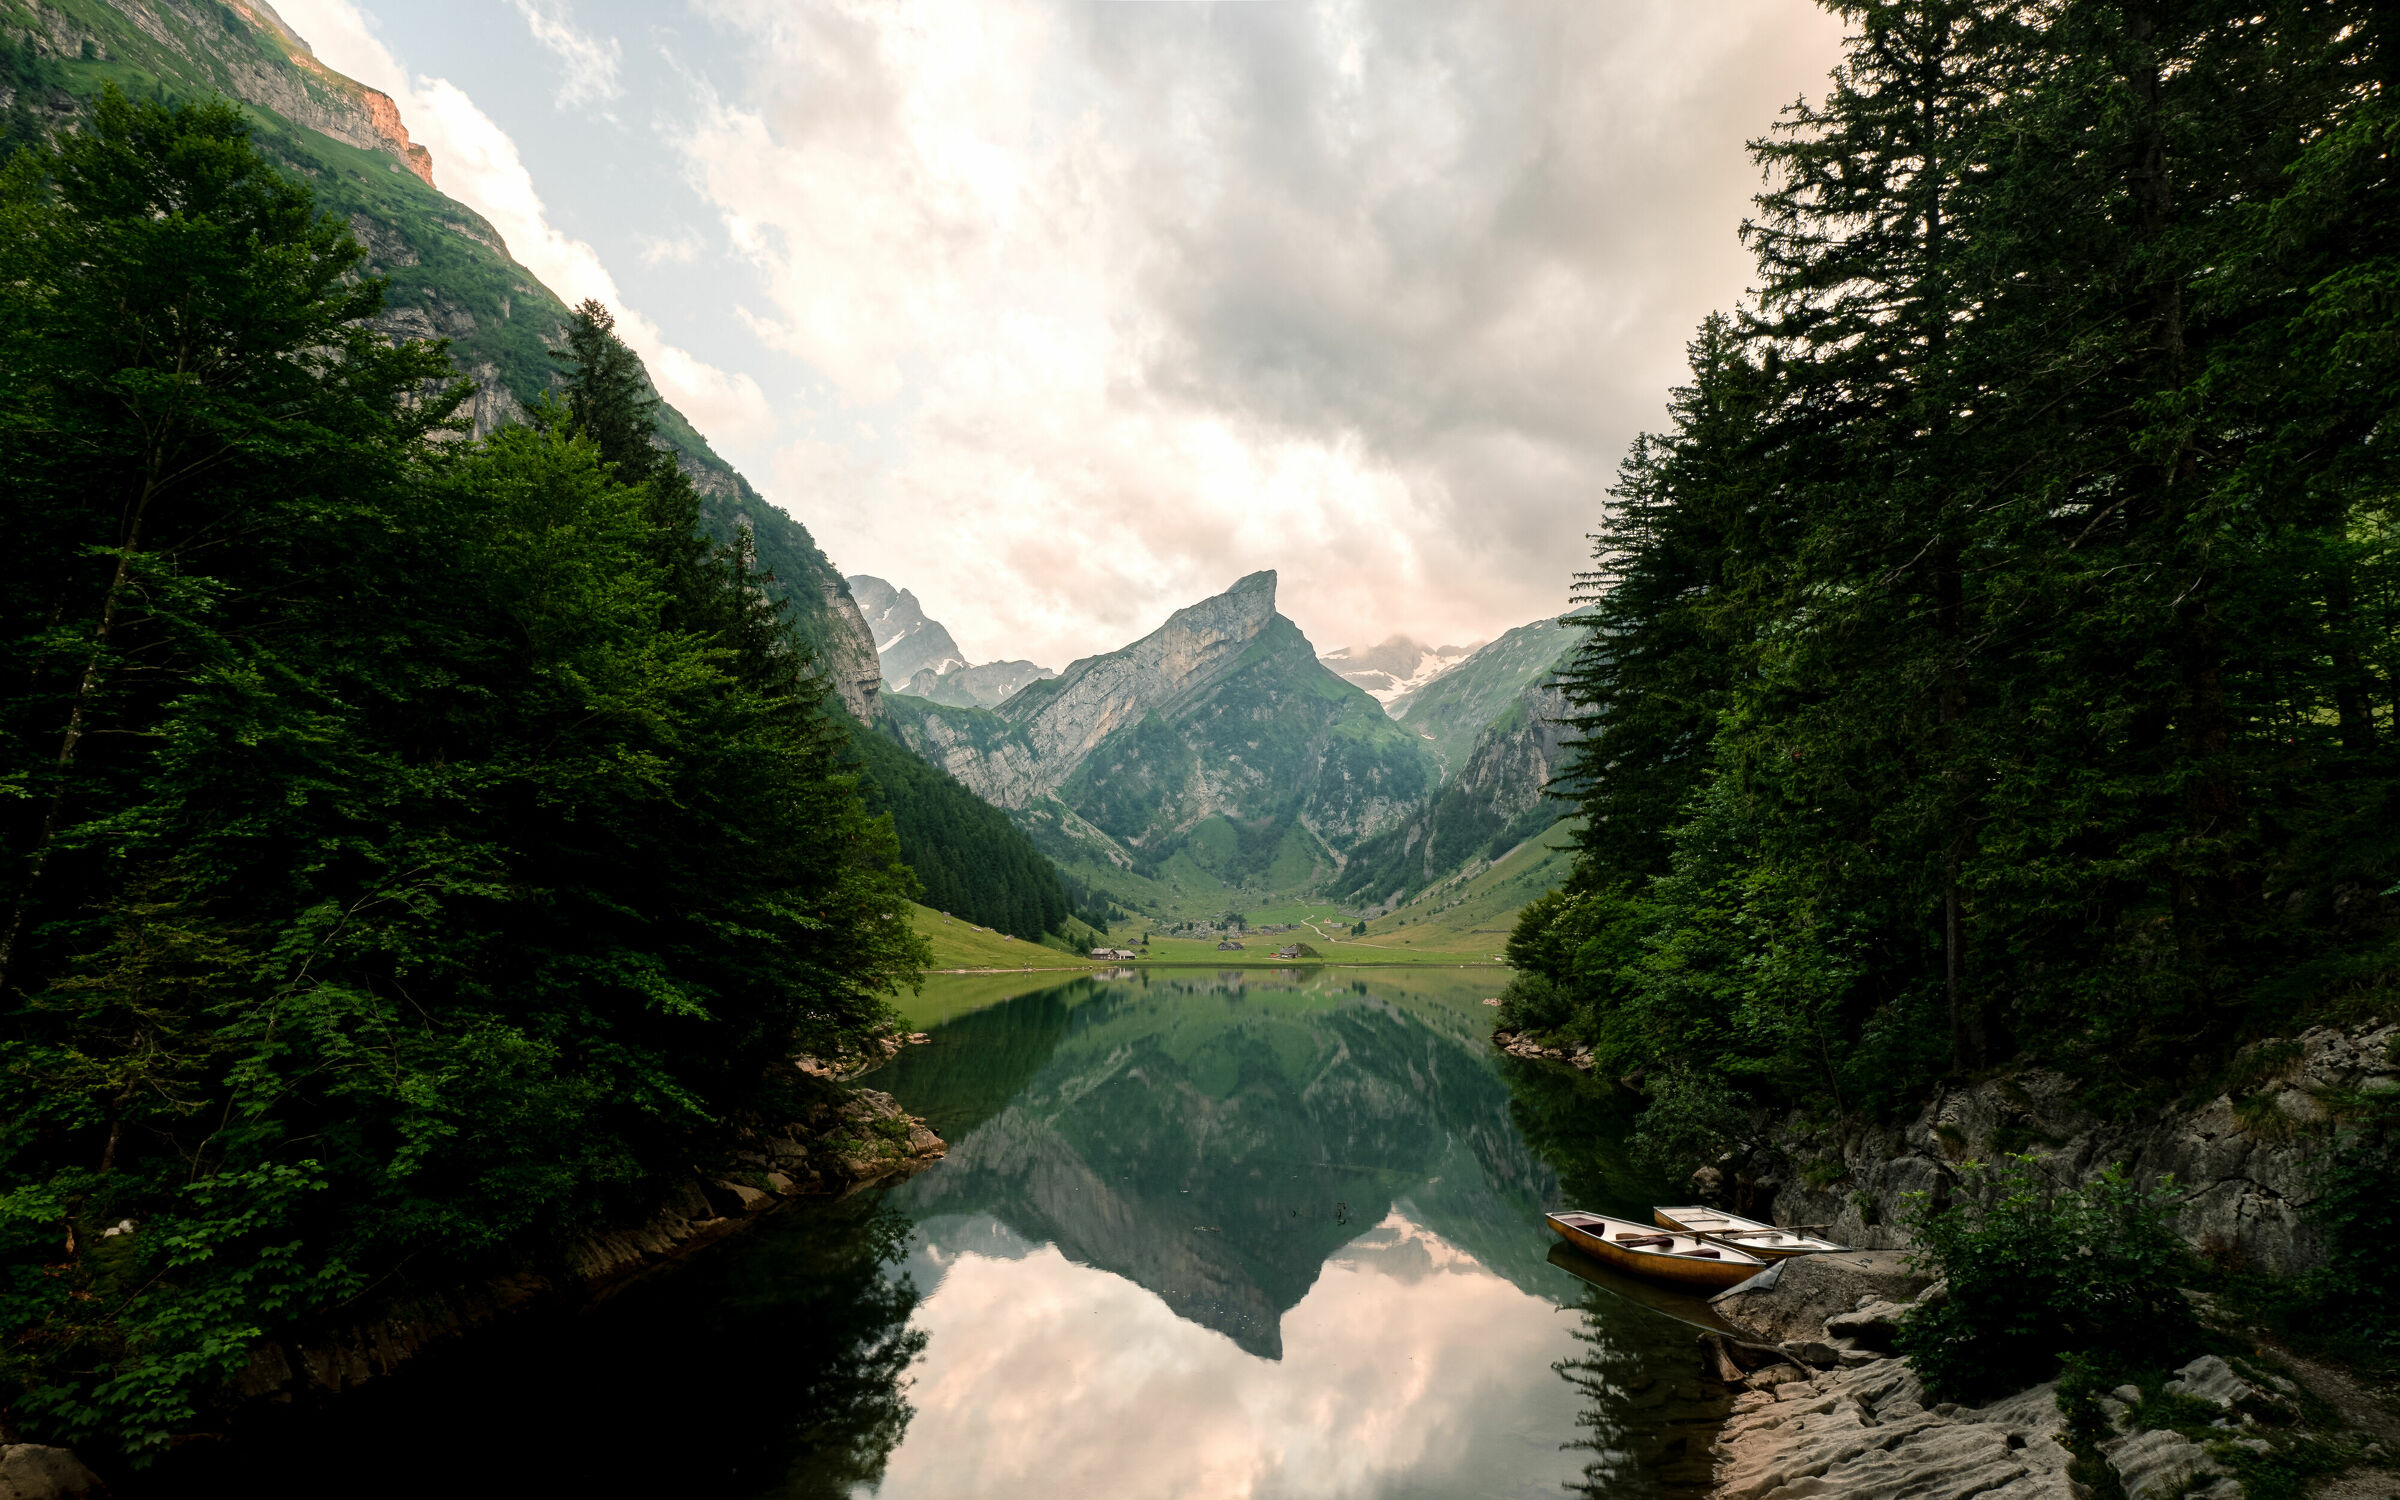 Bild mit Berge, Seen, Sonnenuntergang, Alpen, Boote, Bergsee, Spiegelung, Gebirge, Schweiz, Seealpsee